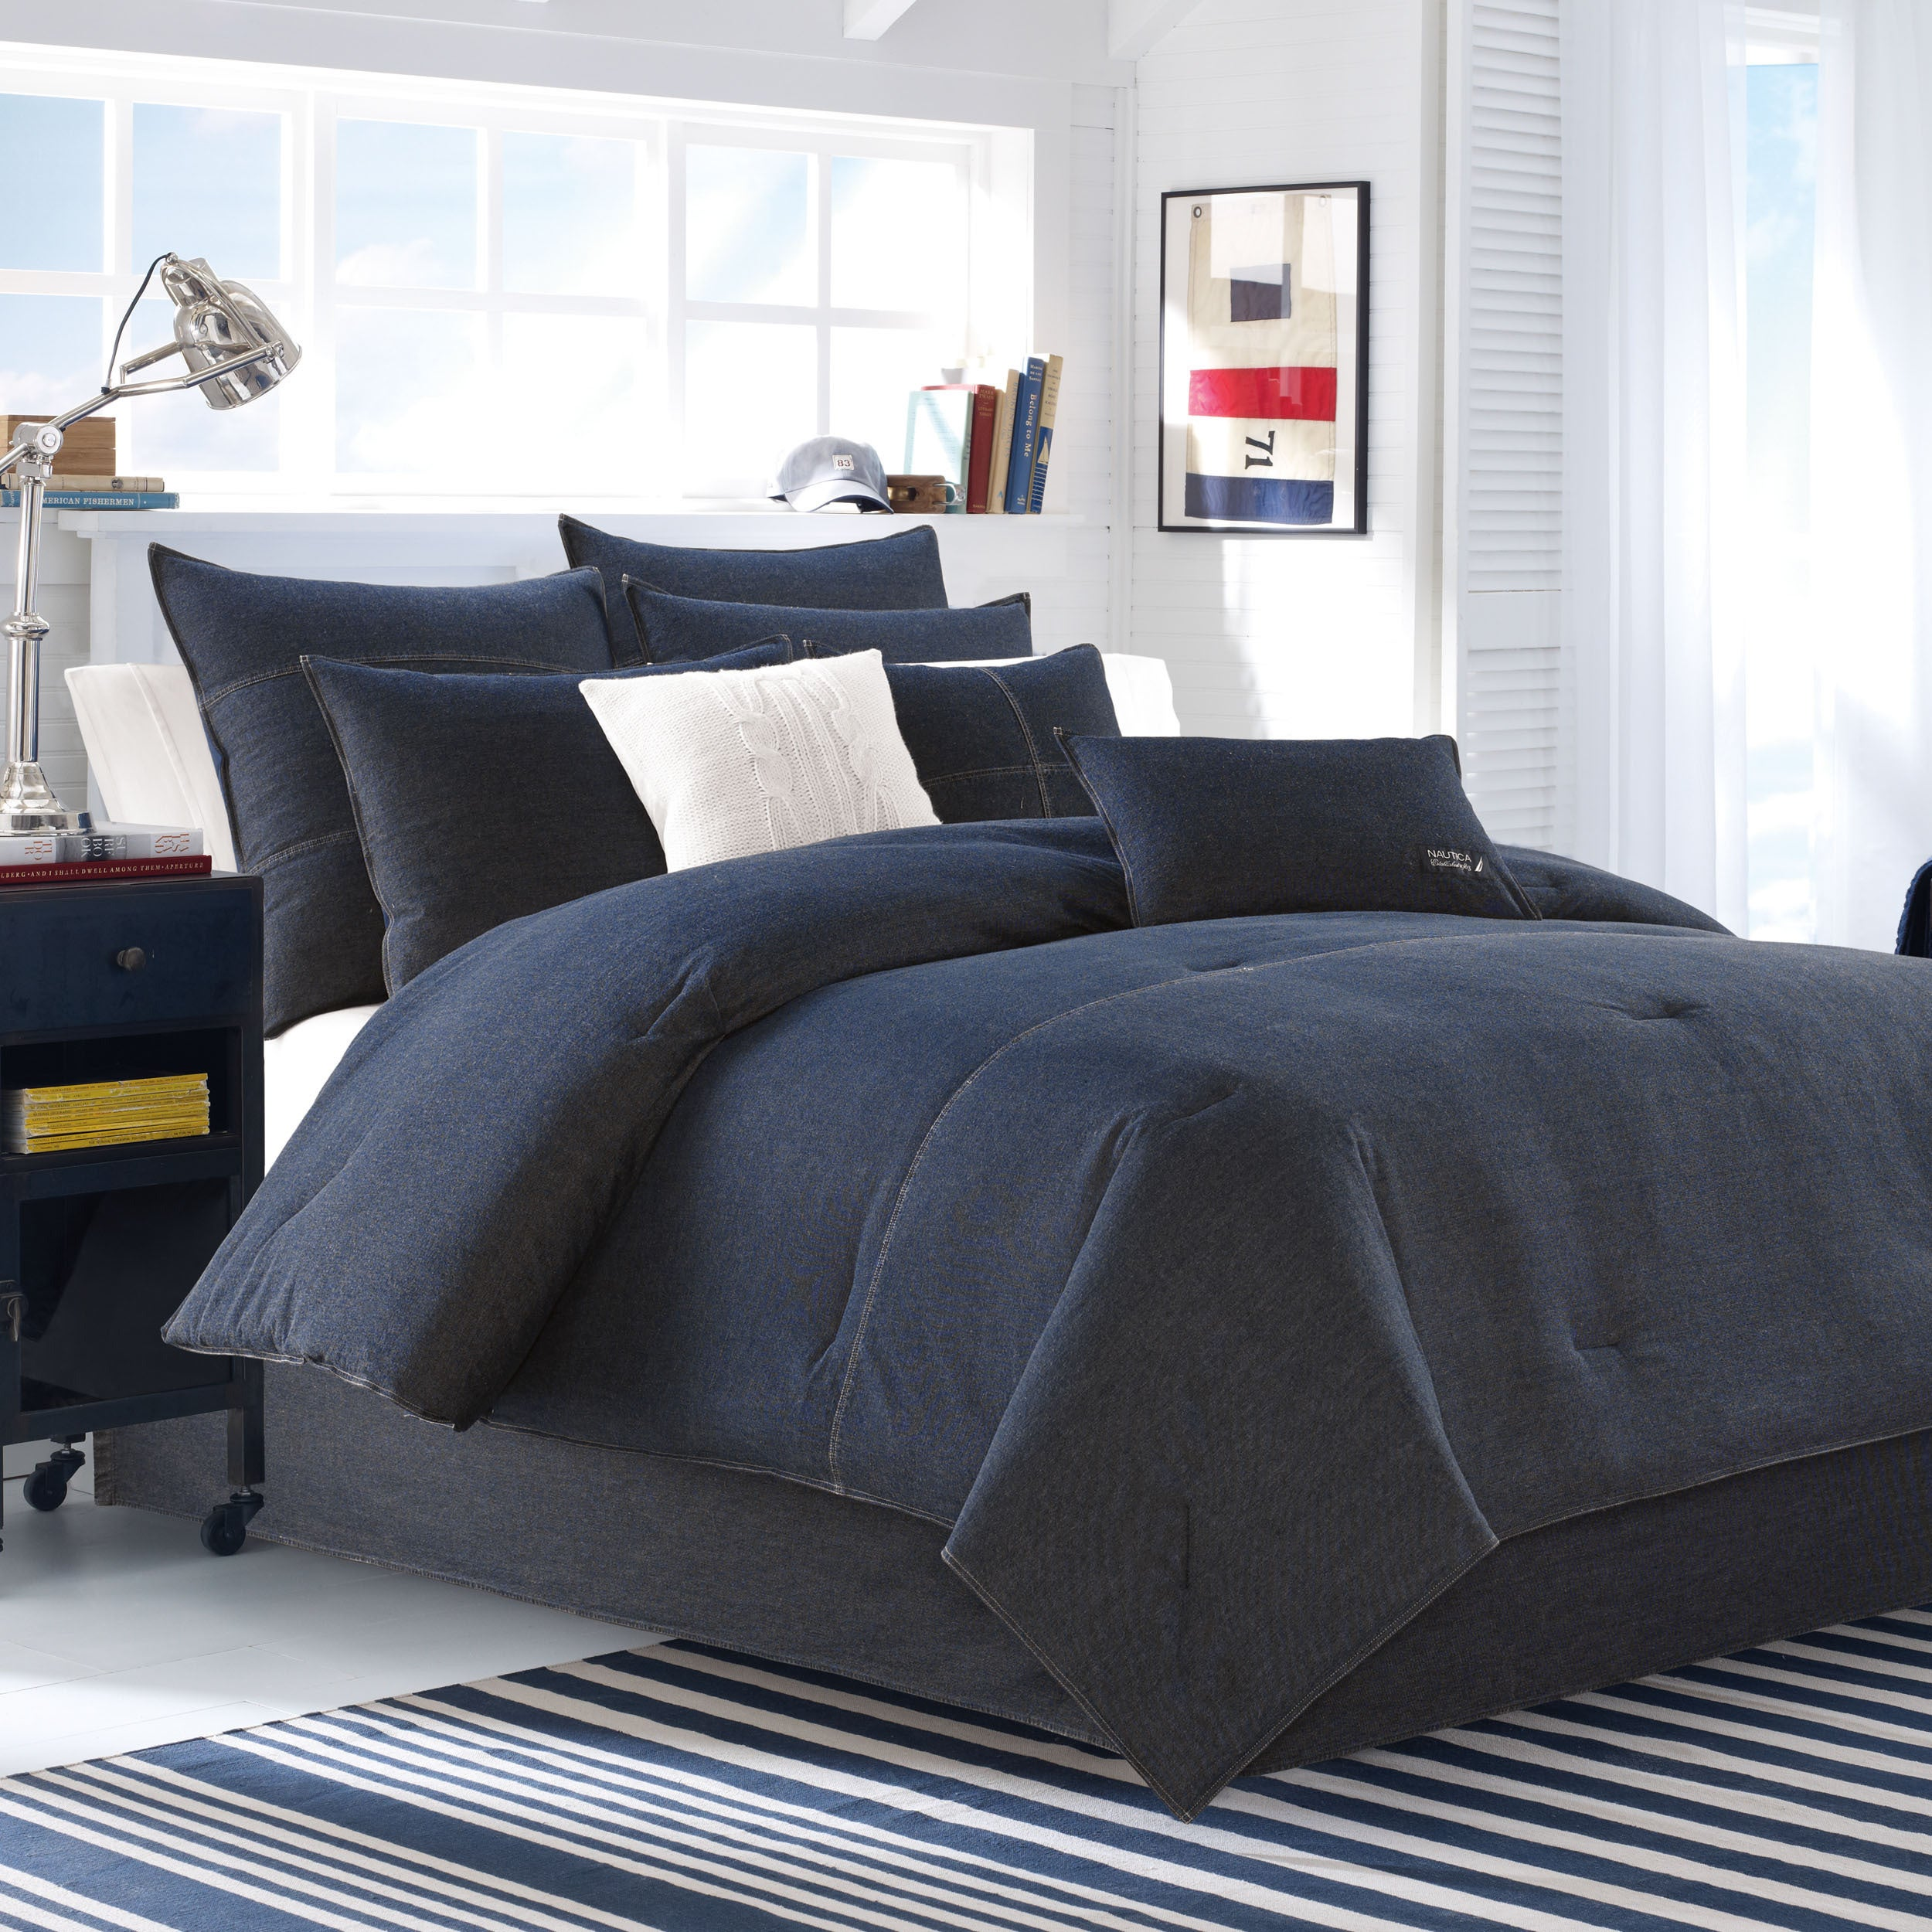 Shop nautica seaward denim 3 piece duvet cover set on sale free shipping today overstock com 10341419